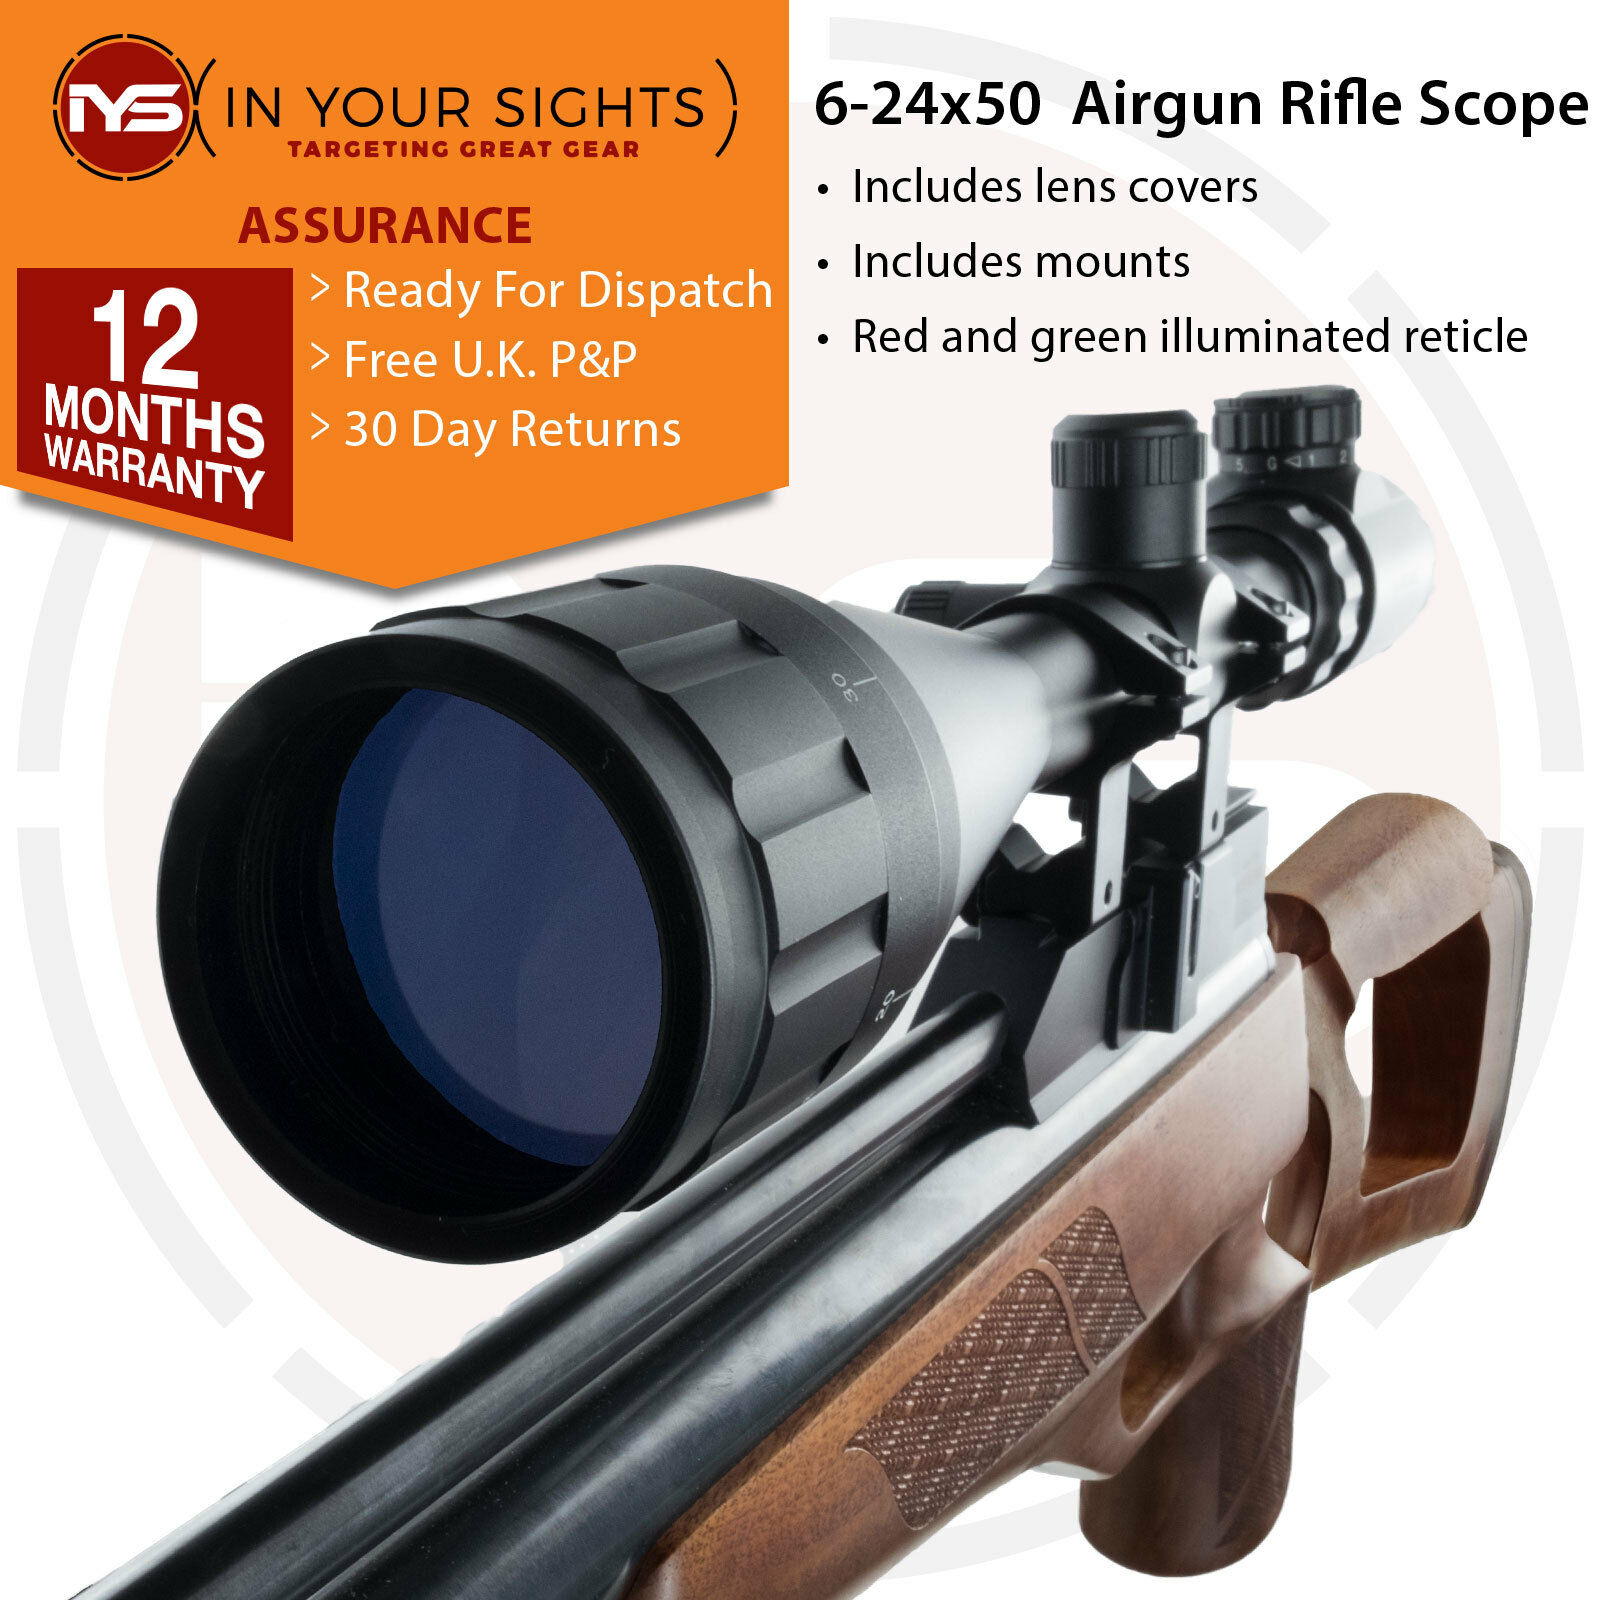 PISTOLA DE AIRE 6-24x50ao Alcance Del Rifle   objetivo ajustable MIRA +